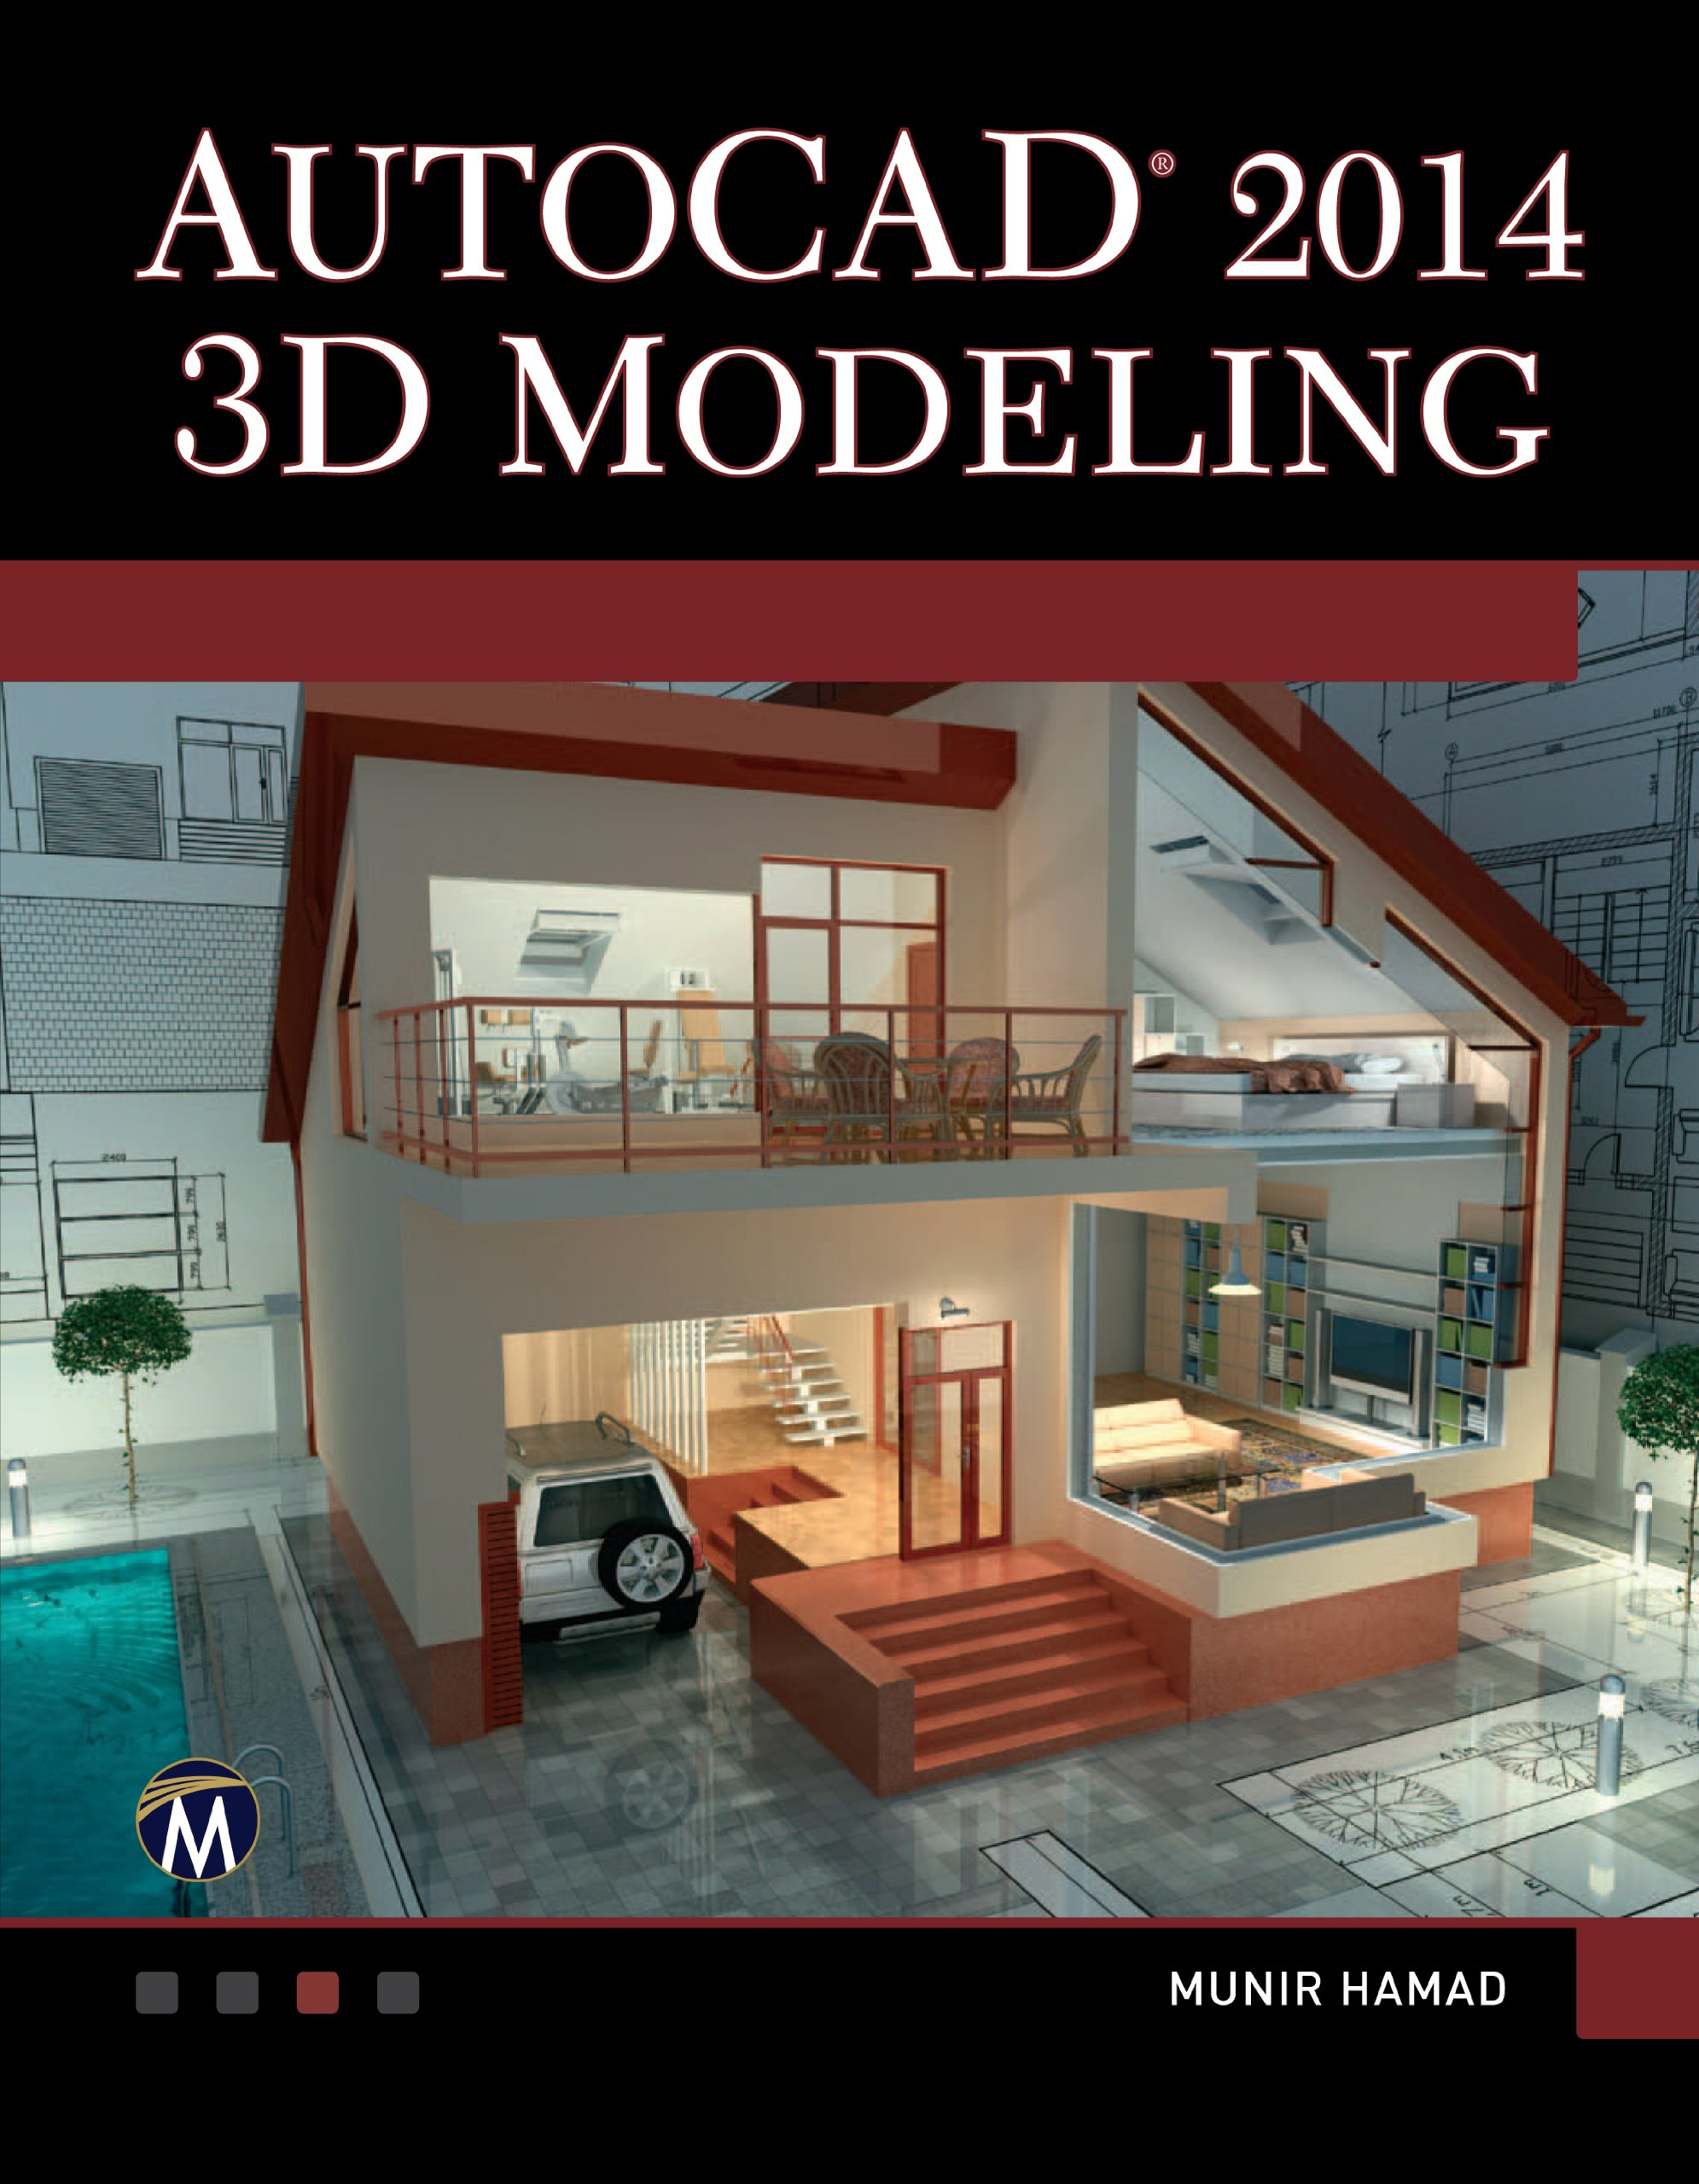 Autocad 3d Modeling Autocad 2014 3d Modeling